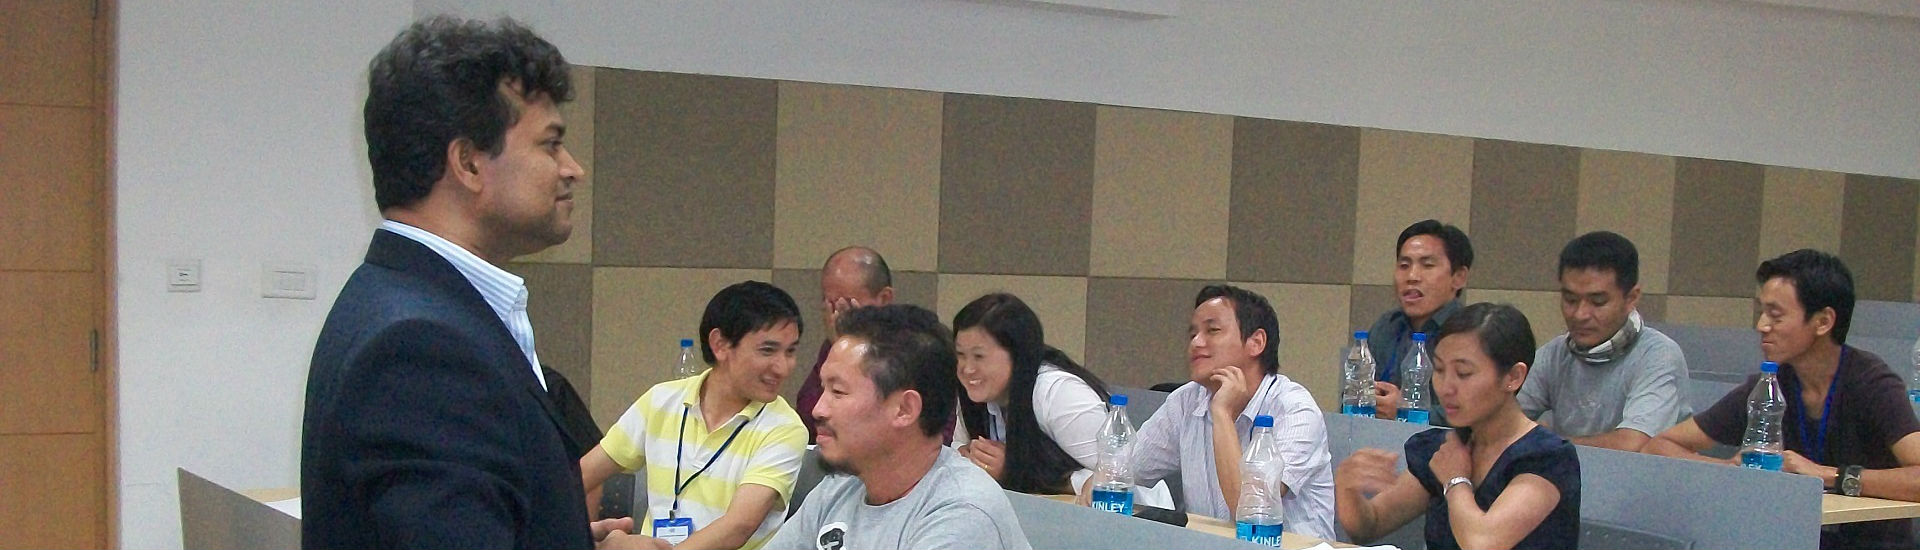 Personality Development Training Workshop (Course)